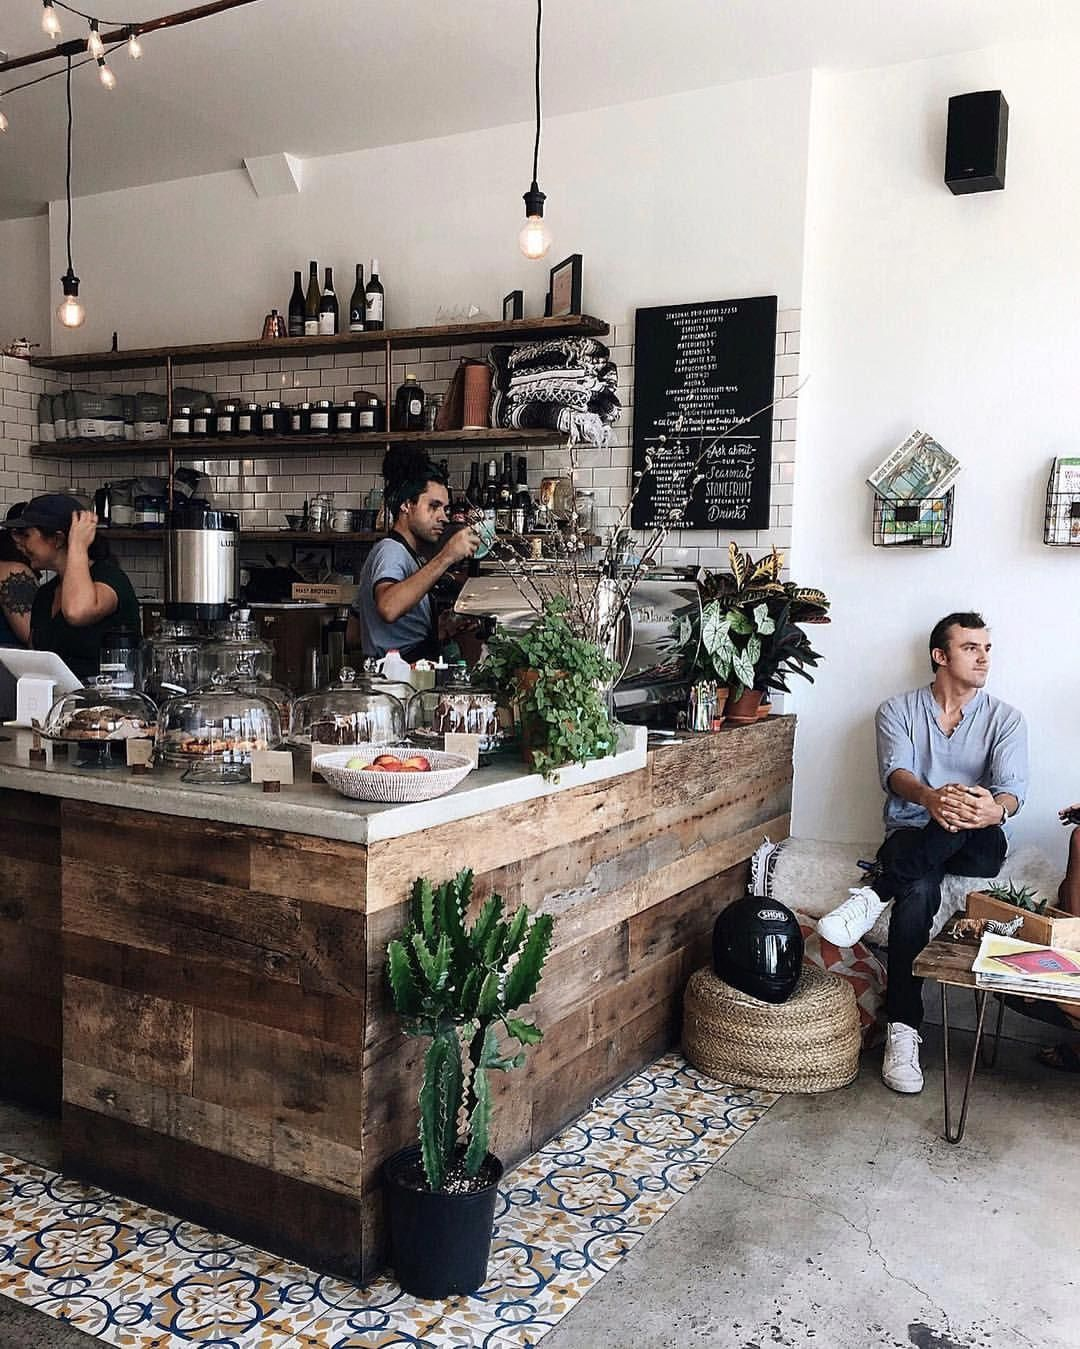 Best Home Decorating Websites Interiordesignsingapore Kitchen Homedecorideas Livingroom Interio Coffee Shop Decor Coffee Shops Interior Coffee Shop Design